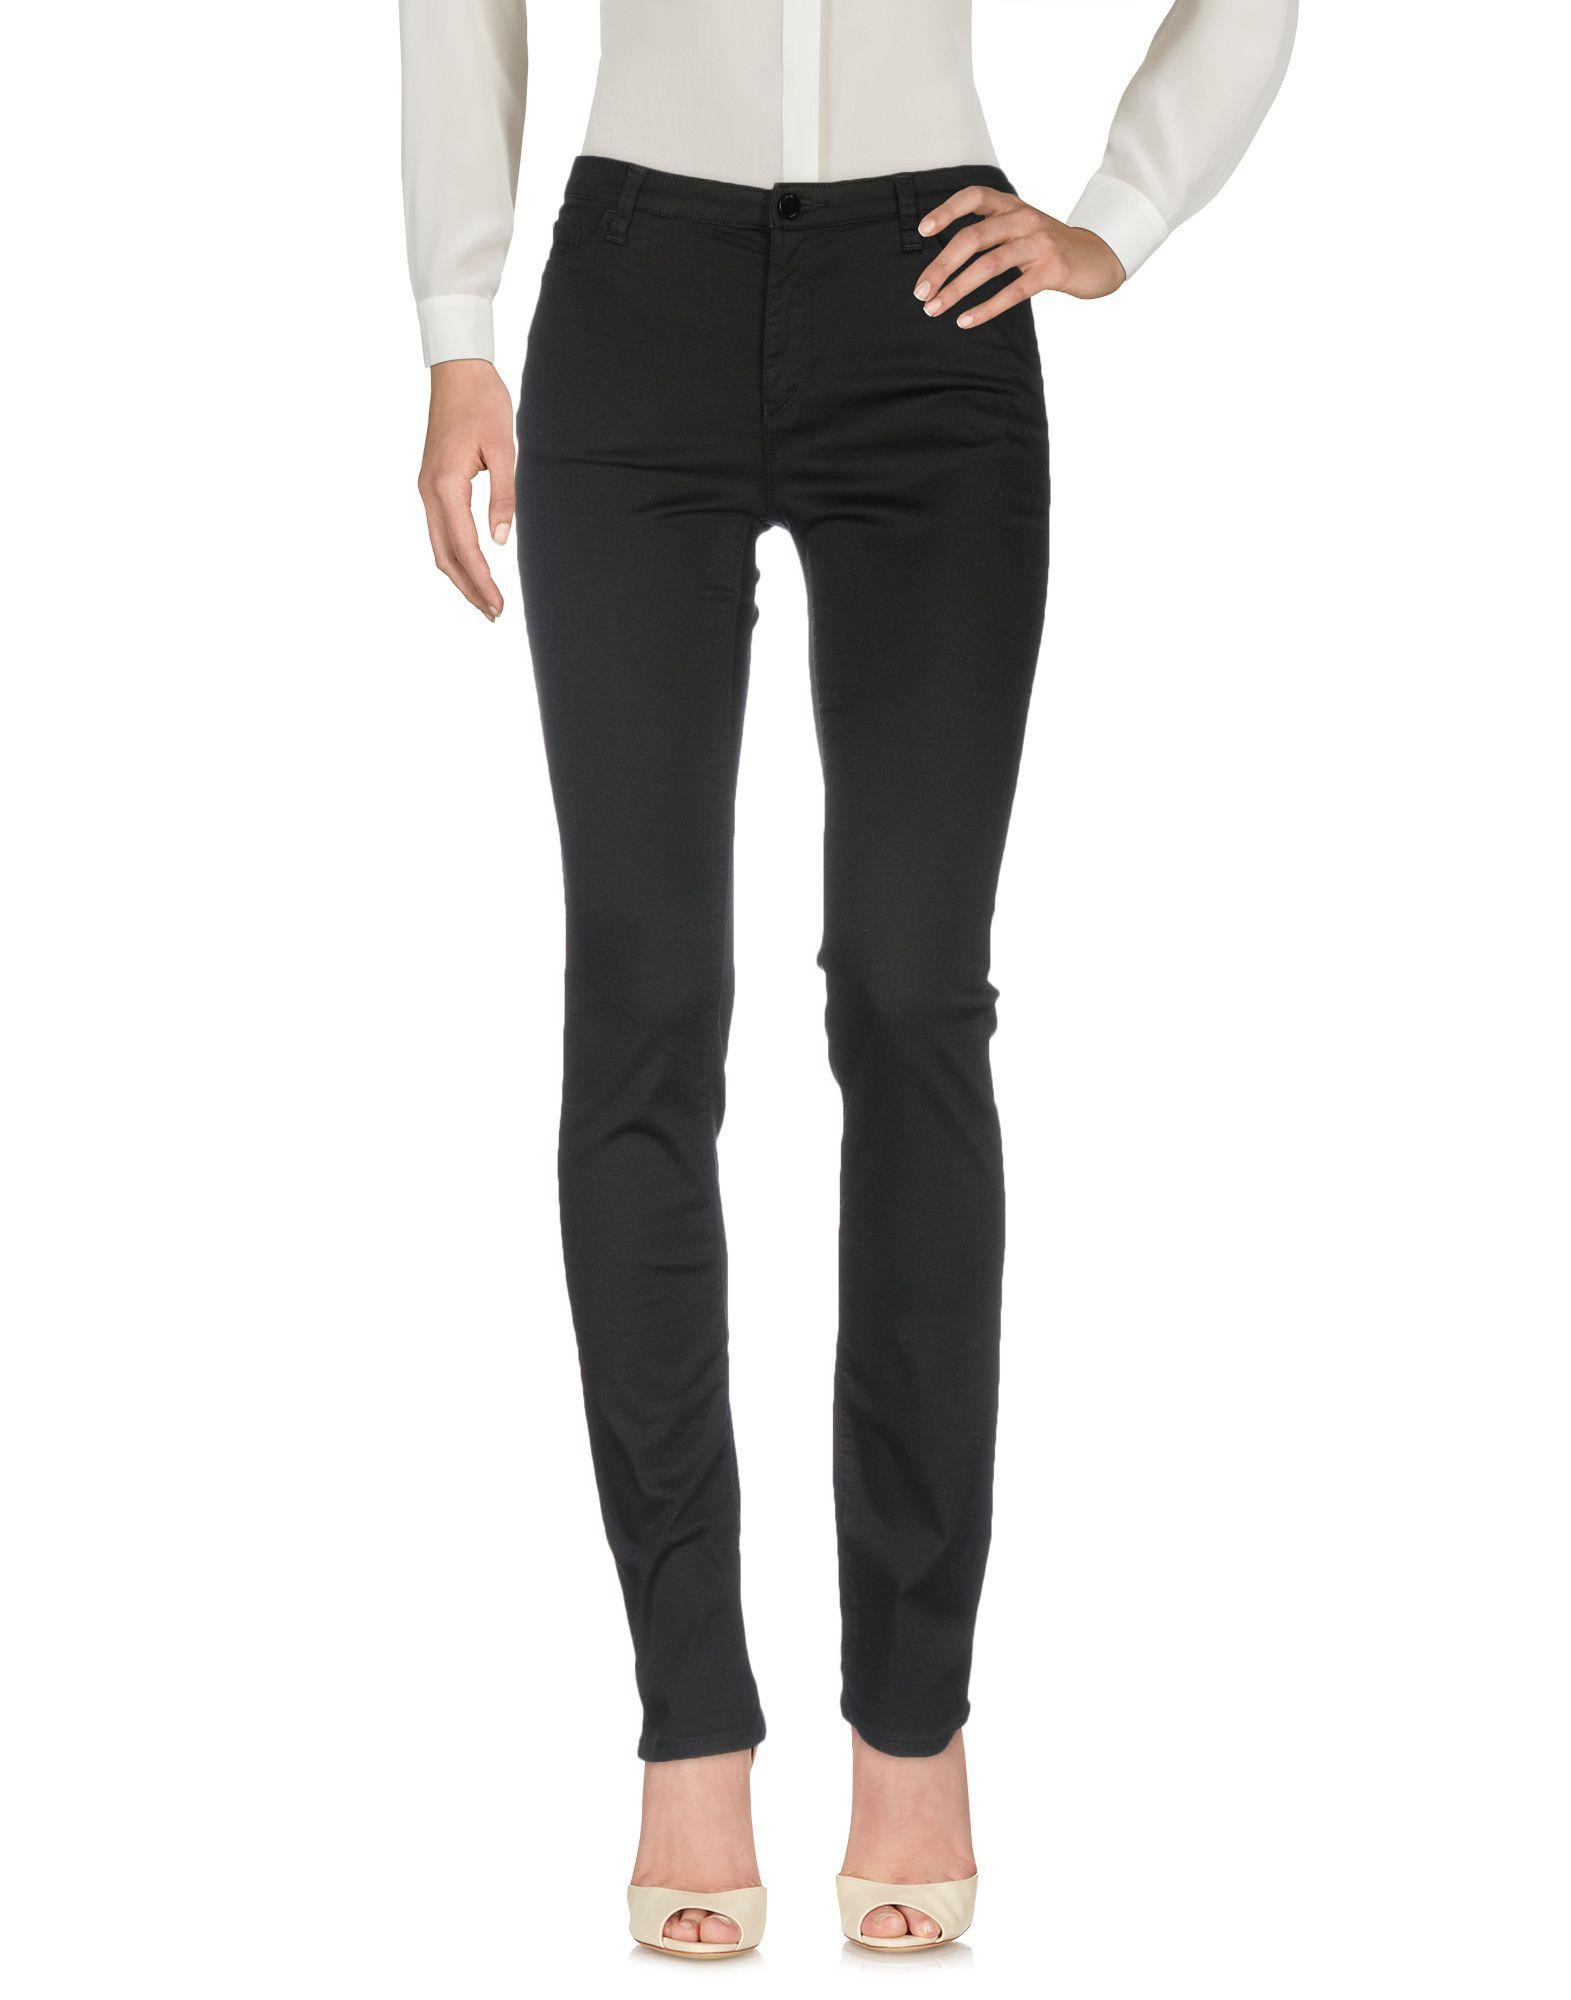 Pantalone Armani Jeans donna donna - 13164242IB  bis zu 70% sparen